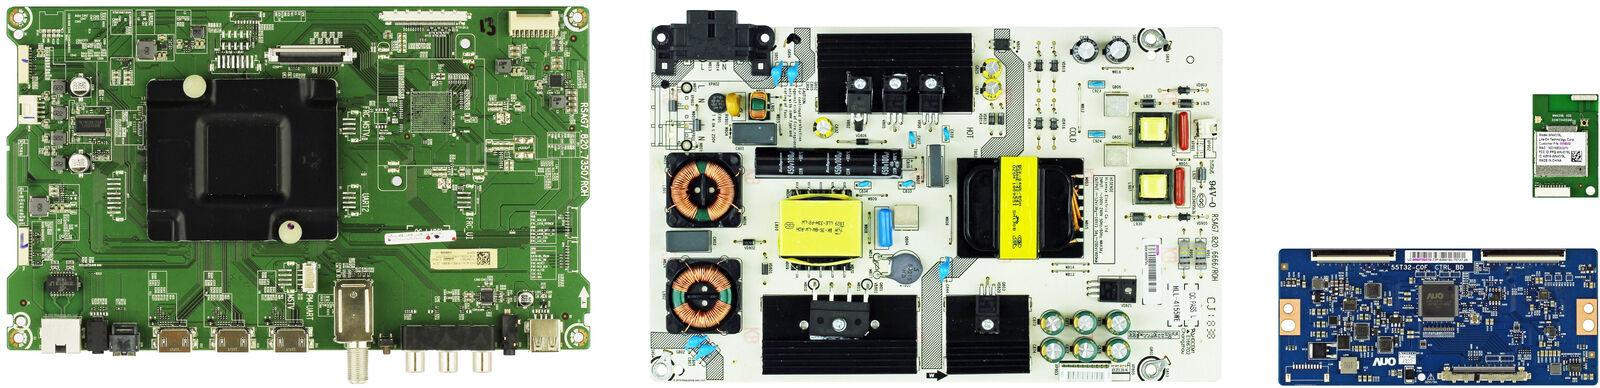 Complete LED TV Repair Parts Kit for Hisense 50CU6000